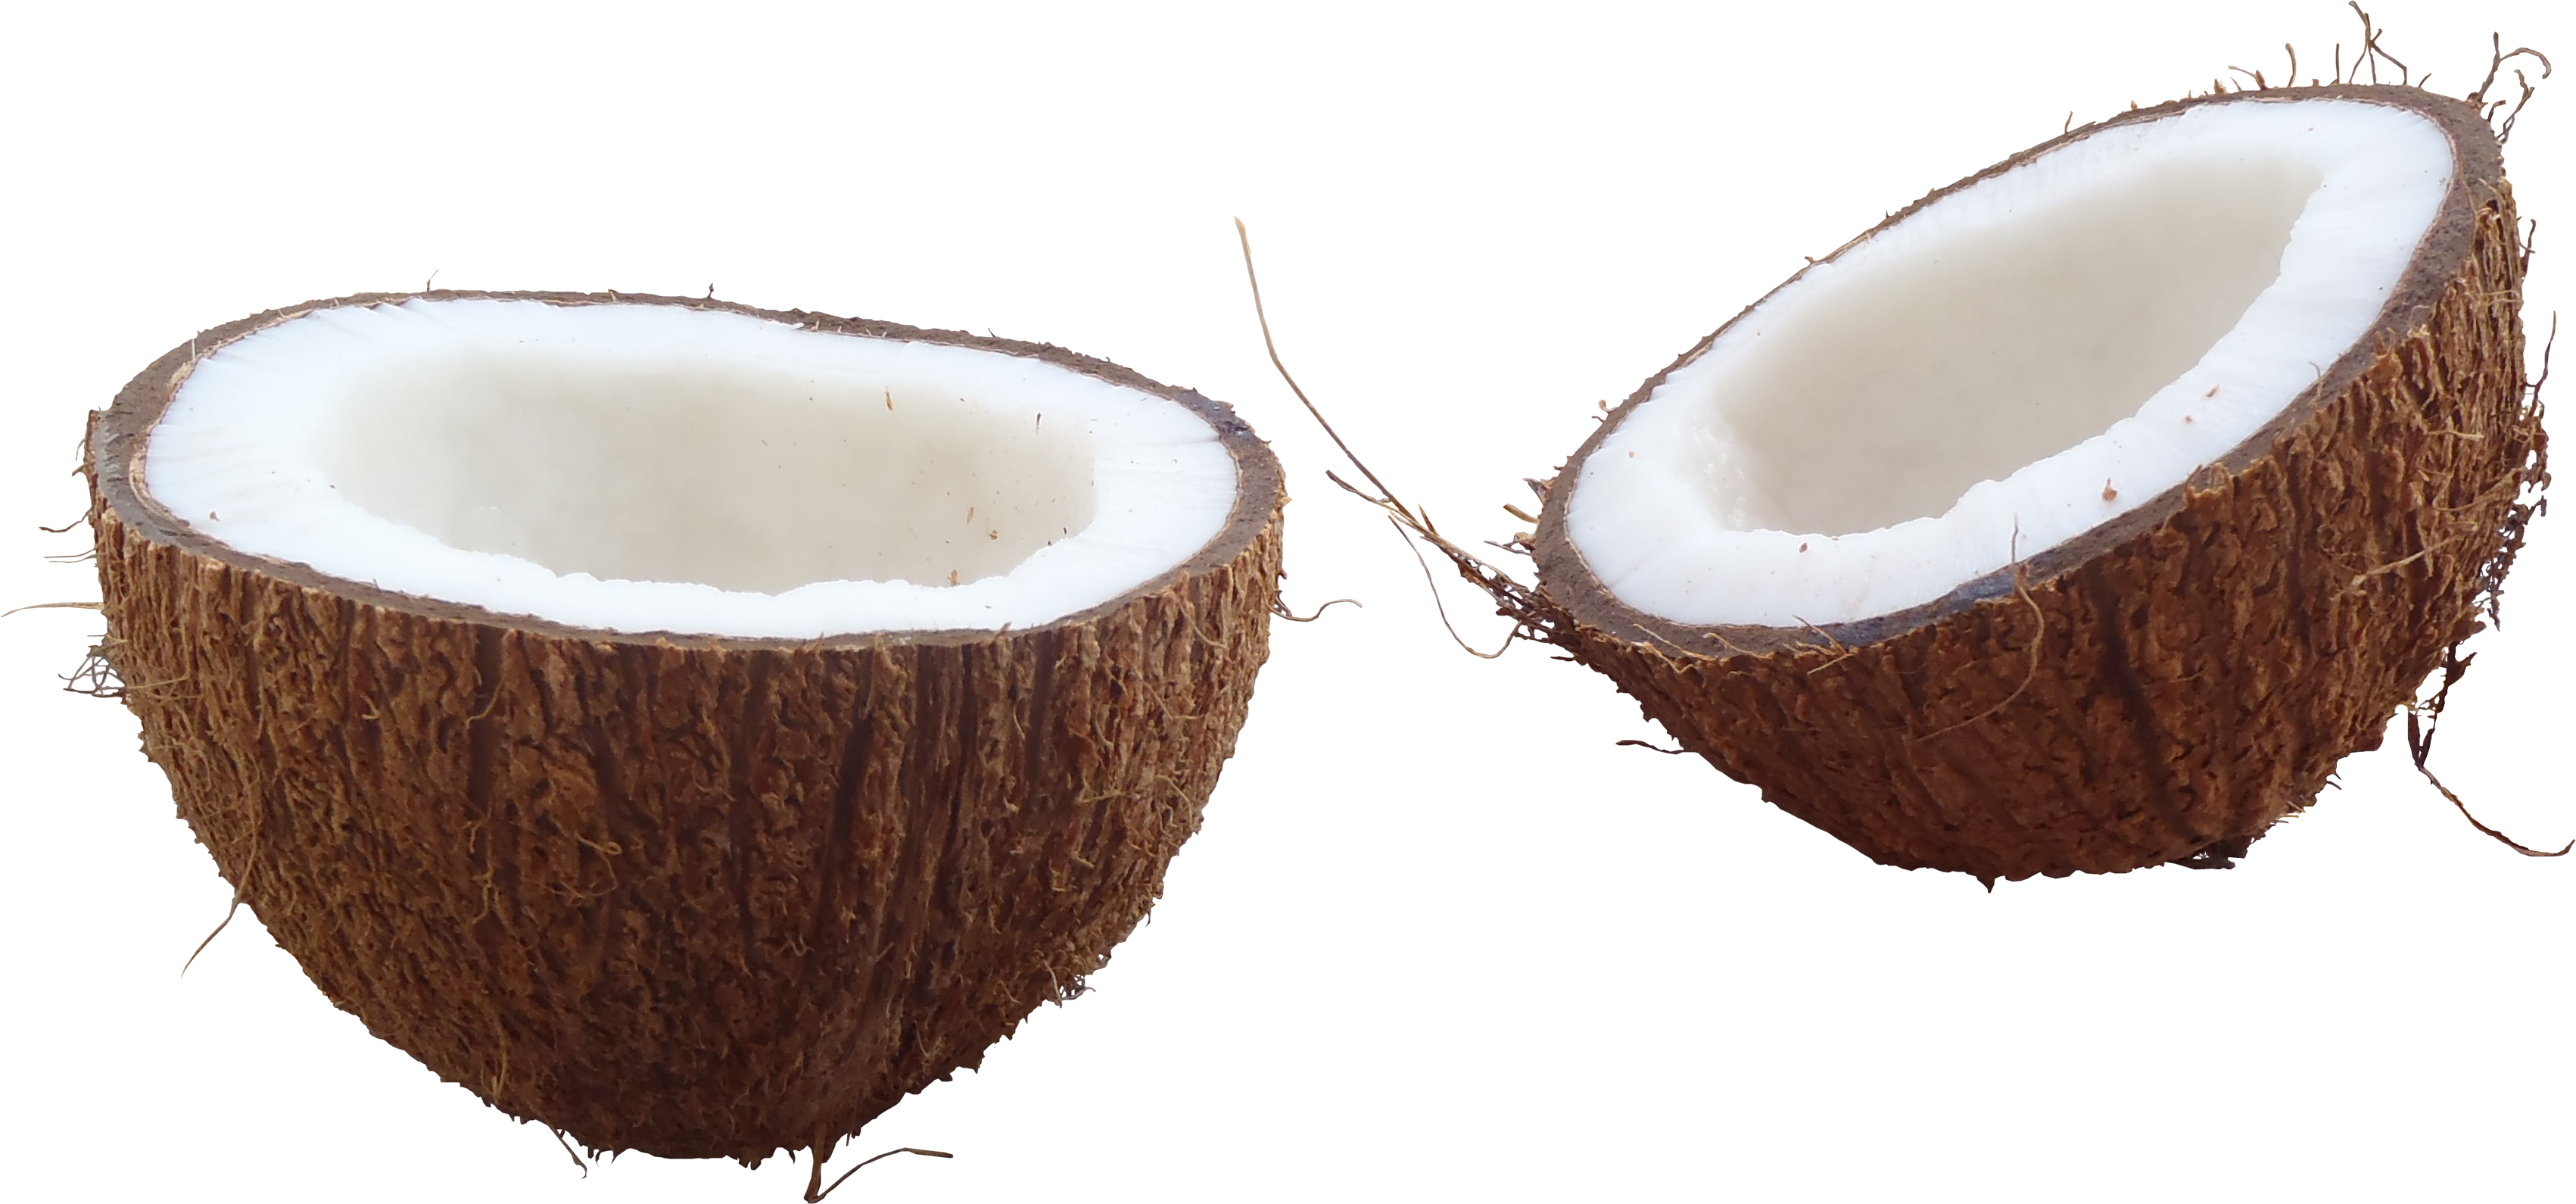 banner download Coconut PNG Images Transparent Free Download